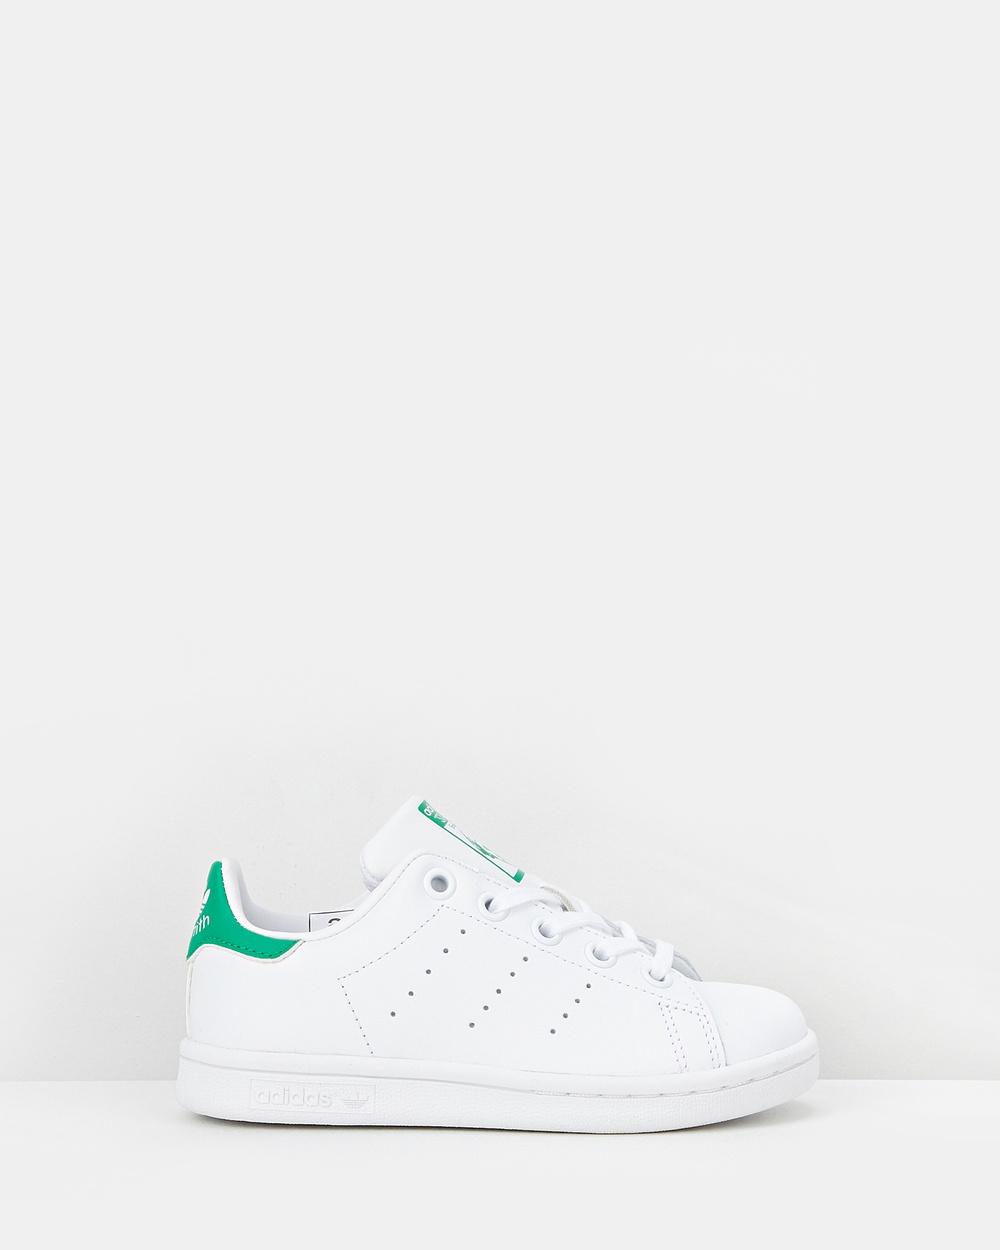 adidas Originals Stan Smith Pre School Lifestyle Shoes White/Green